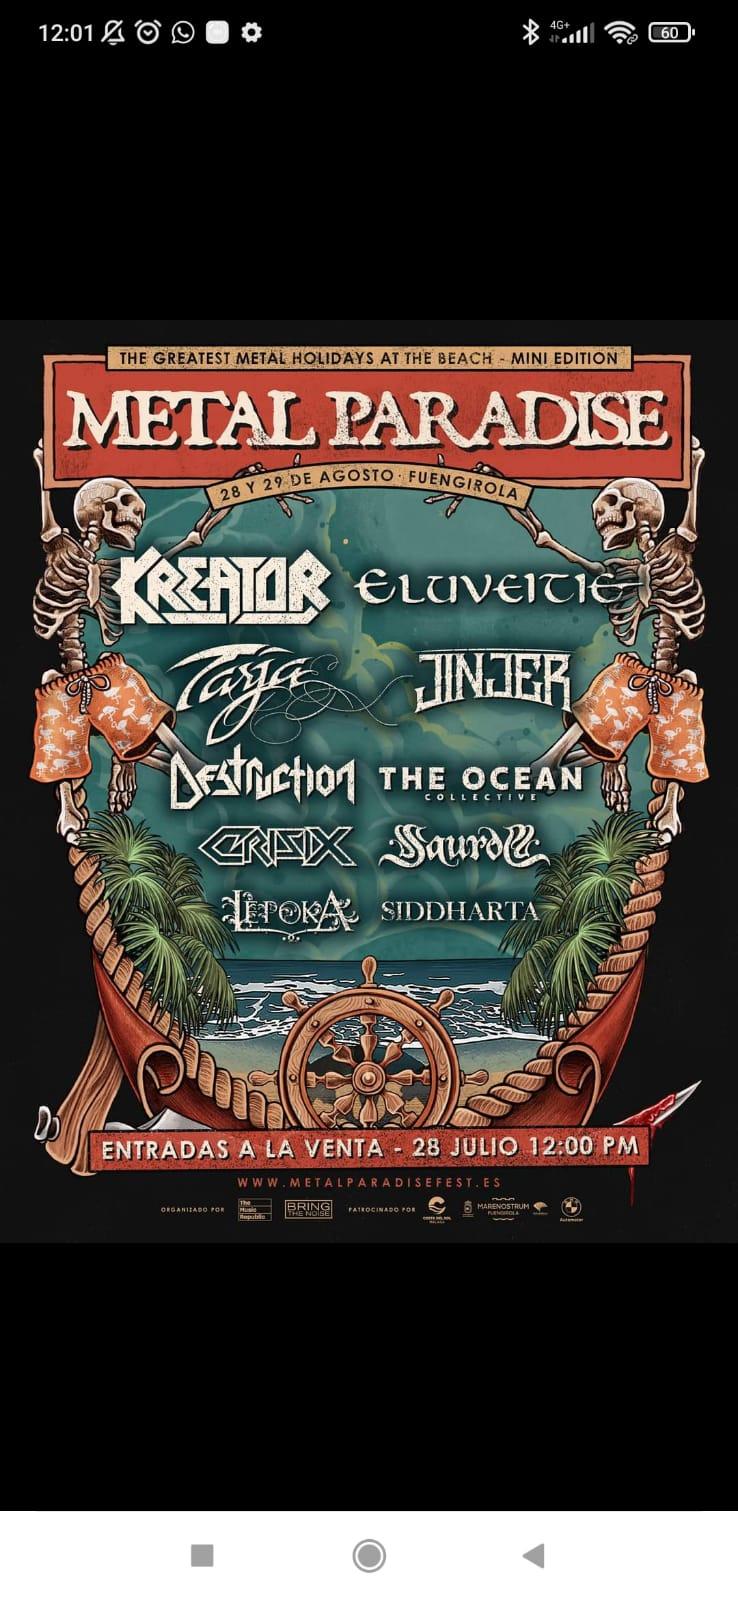 Resurrection Fest Estrella Galicia 2022. (29 - 3 Julio) Avenged Sevenfold, KoRn, Deftones, Sabaton y Bourbon! - Página 9 Img-2040